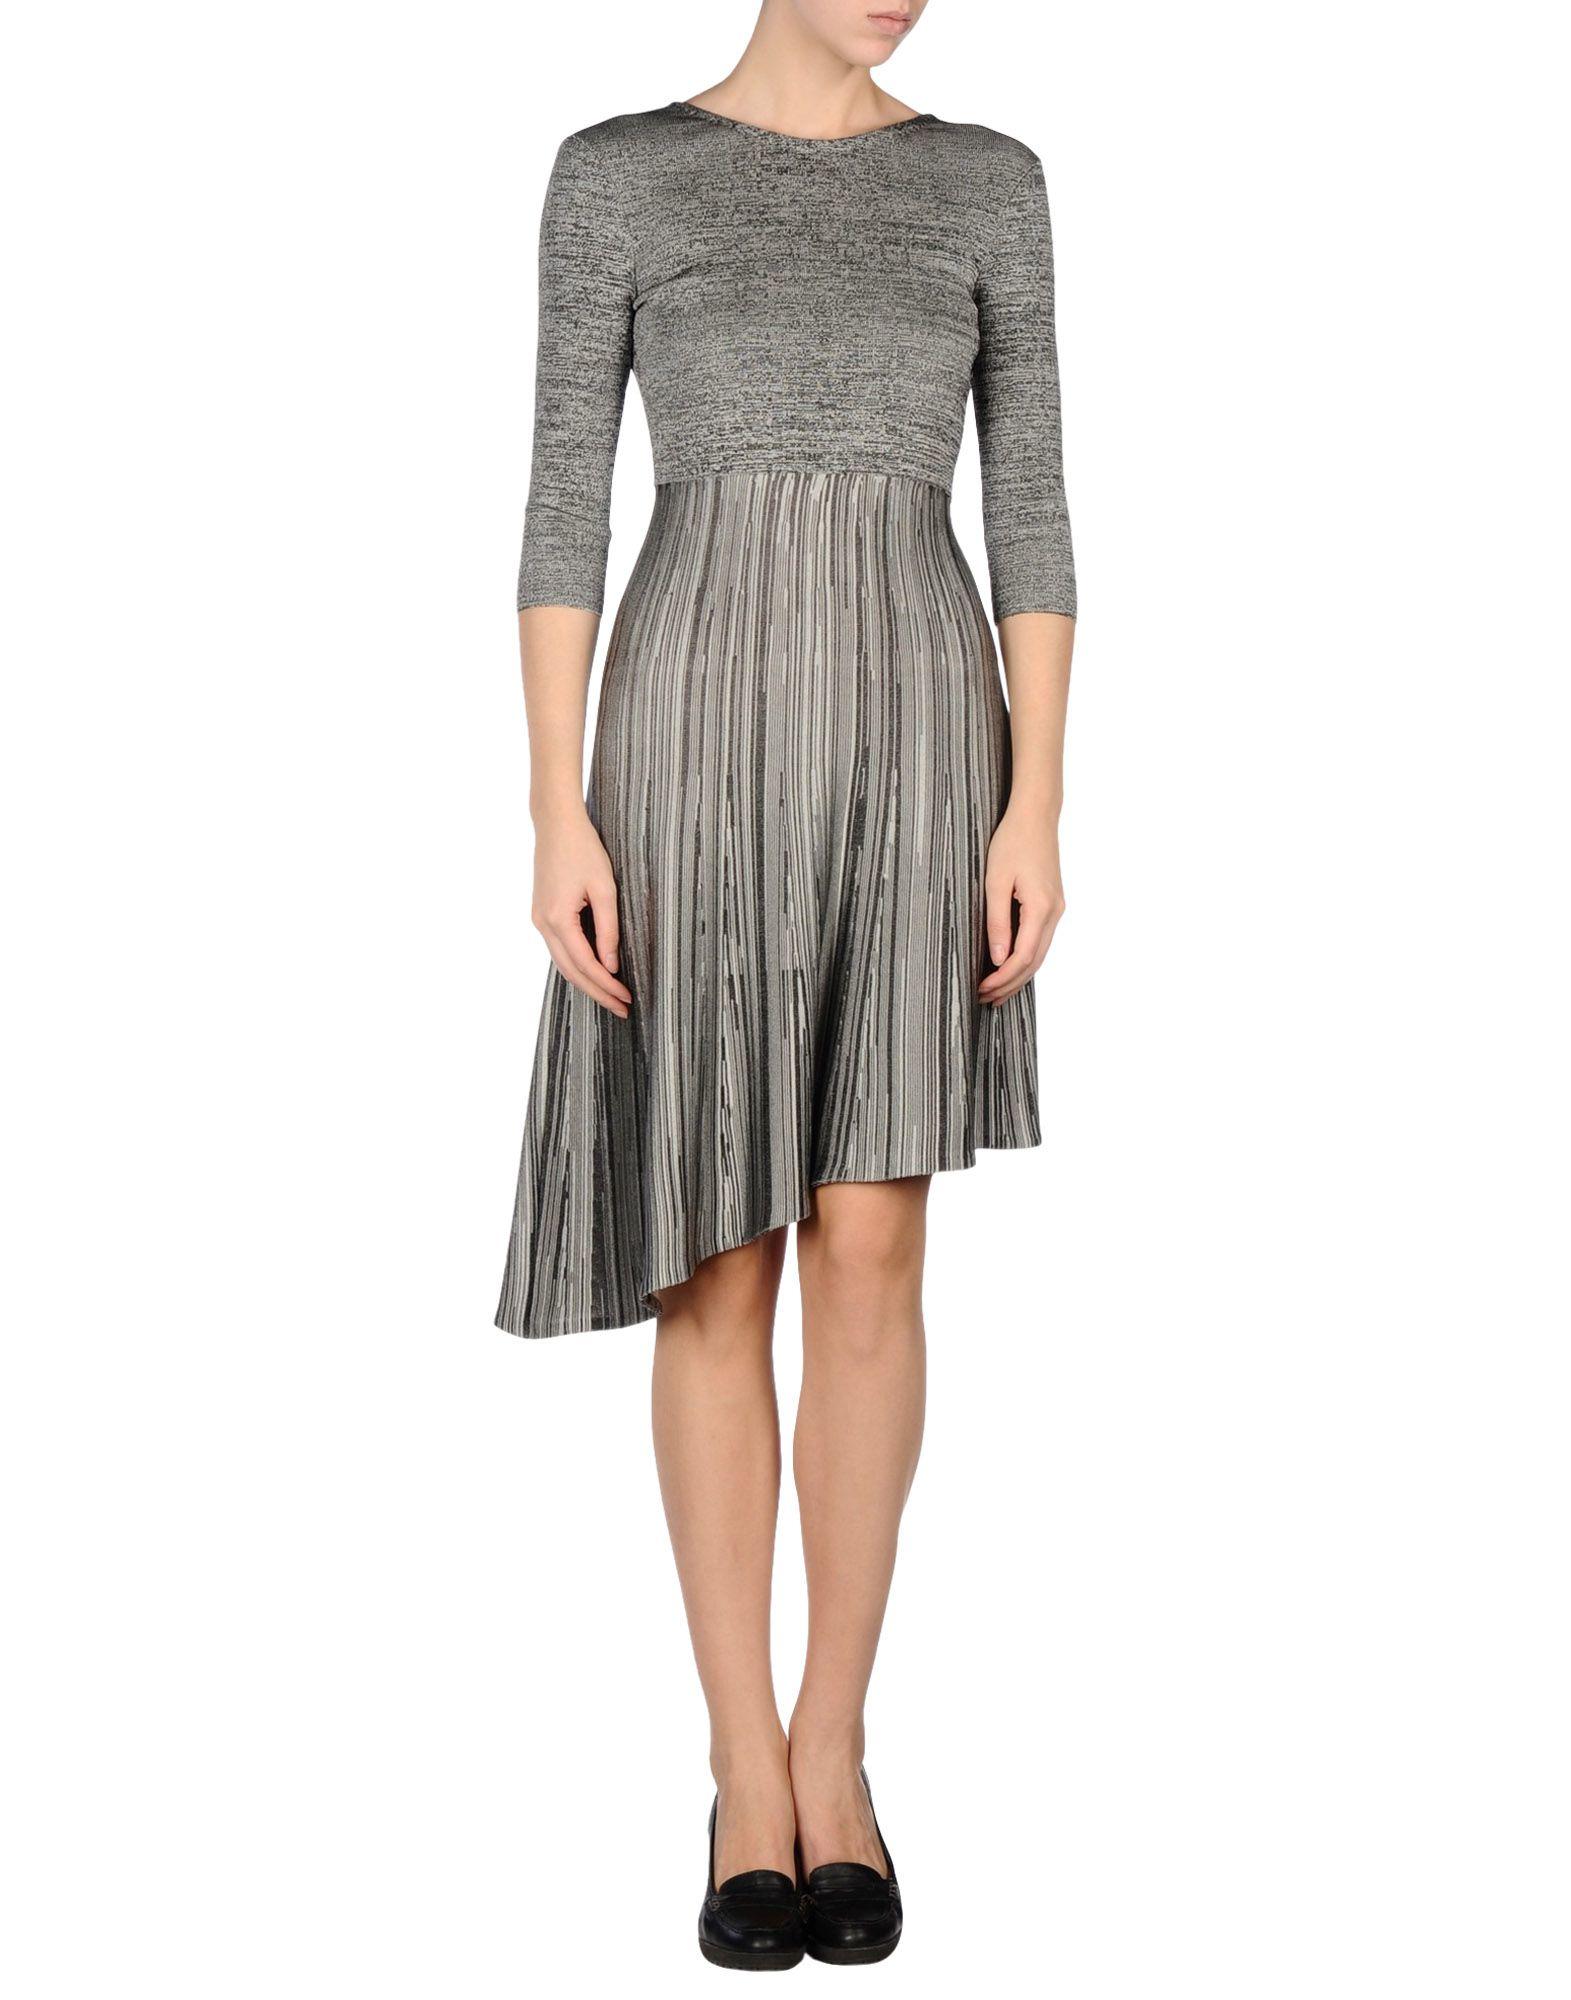 dior short dresses - photo #21